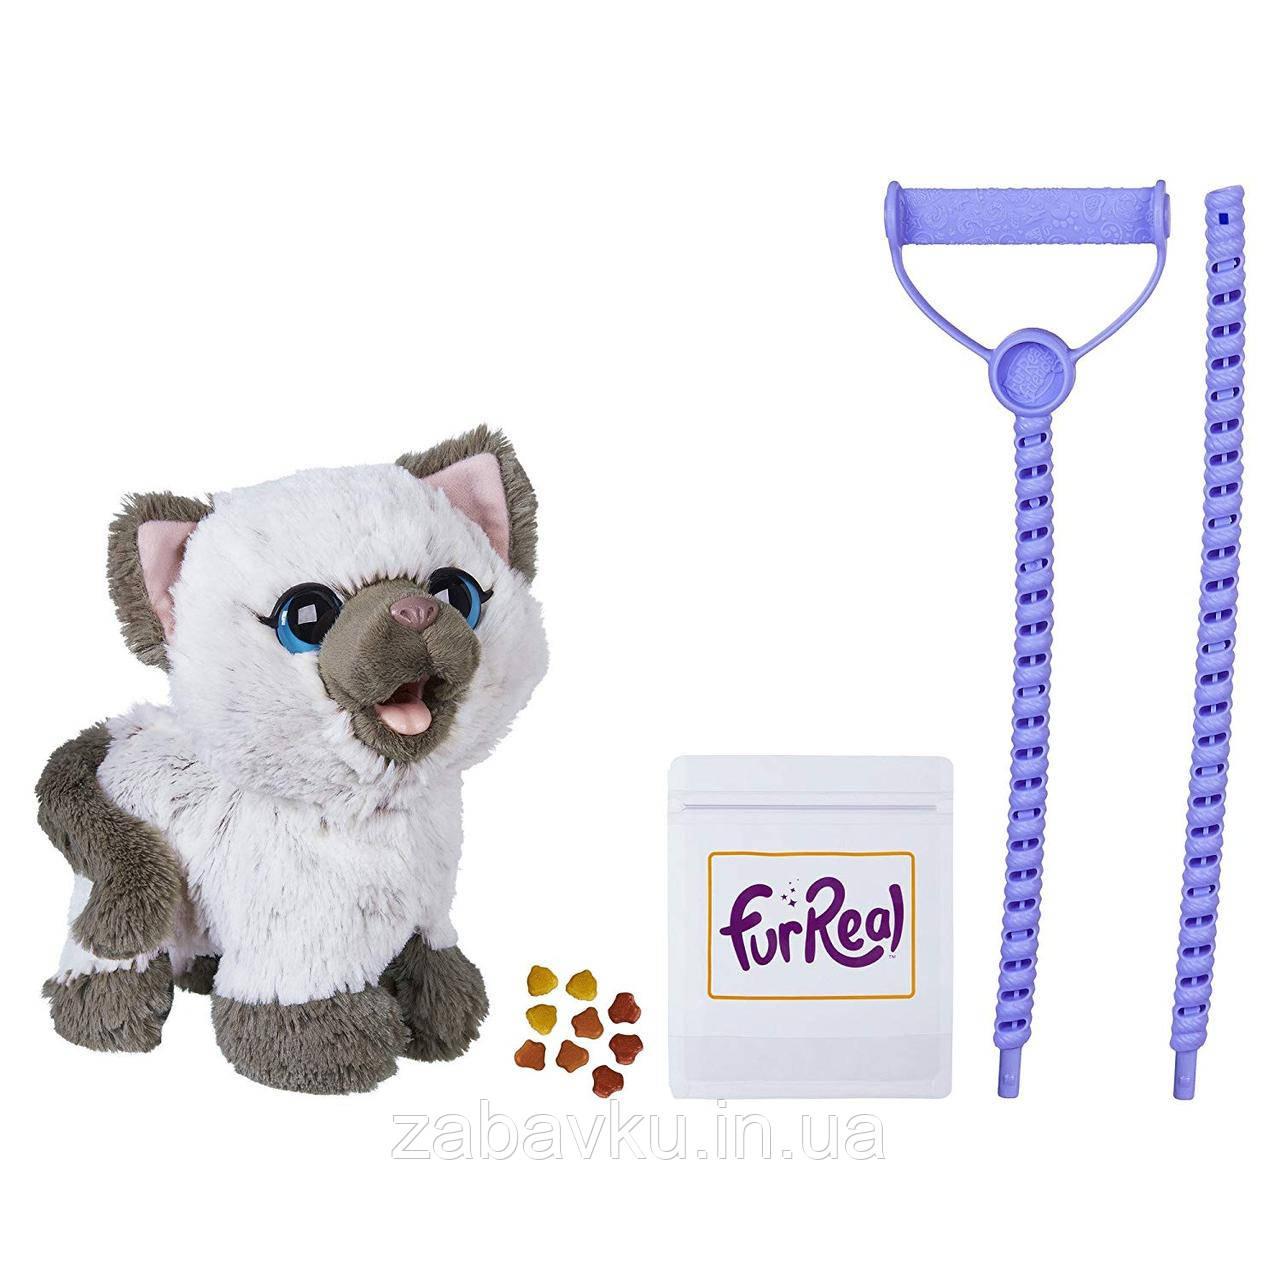 Інтерактивне кошеня Фурріал   FurReal Friends Kami My Poopin Kitty